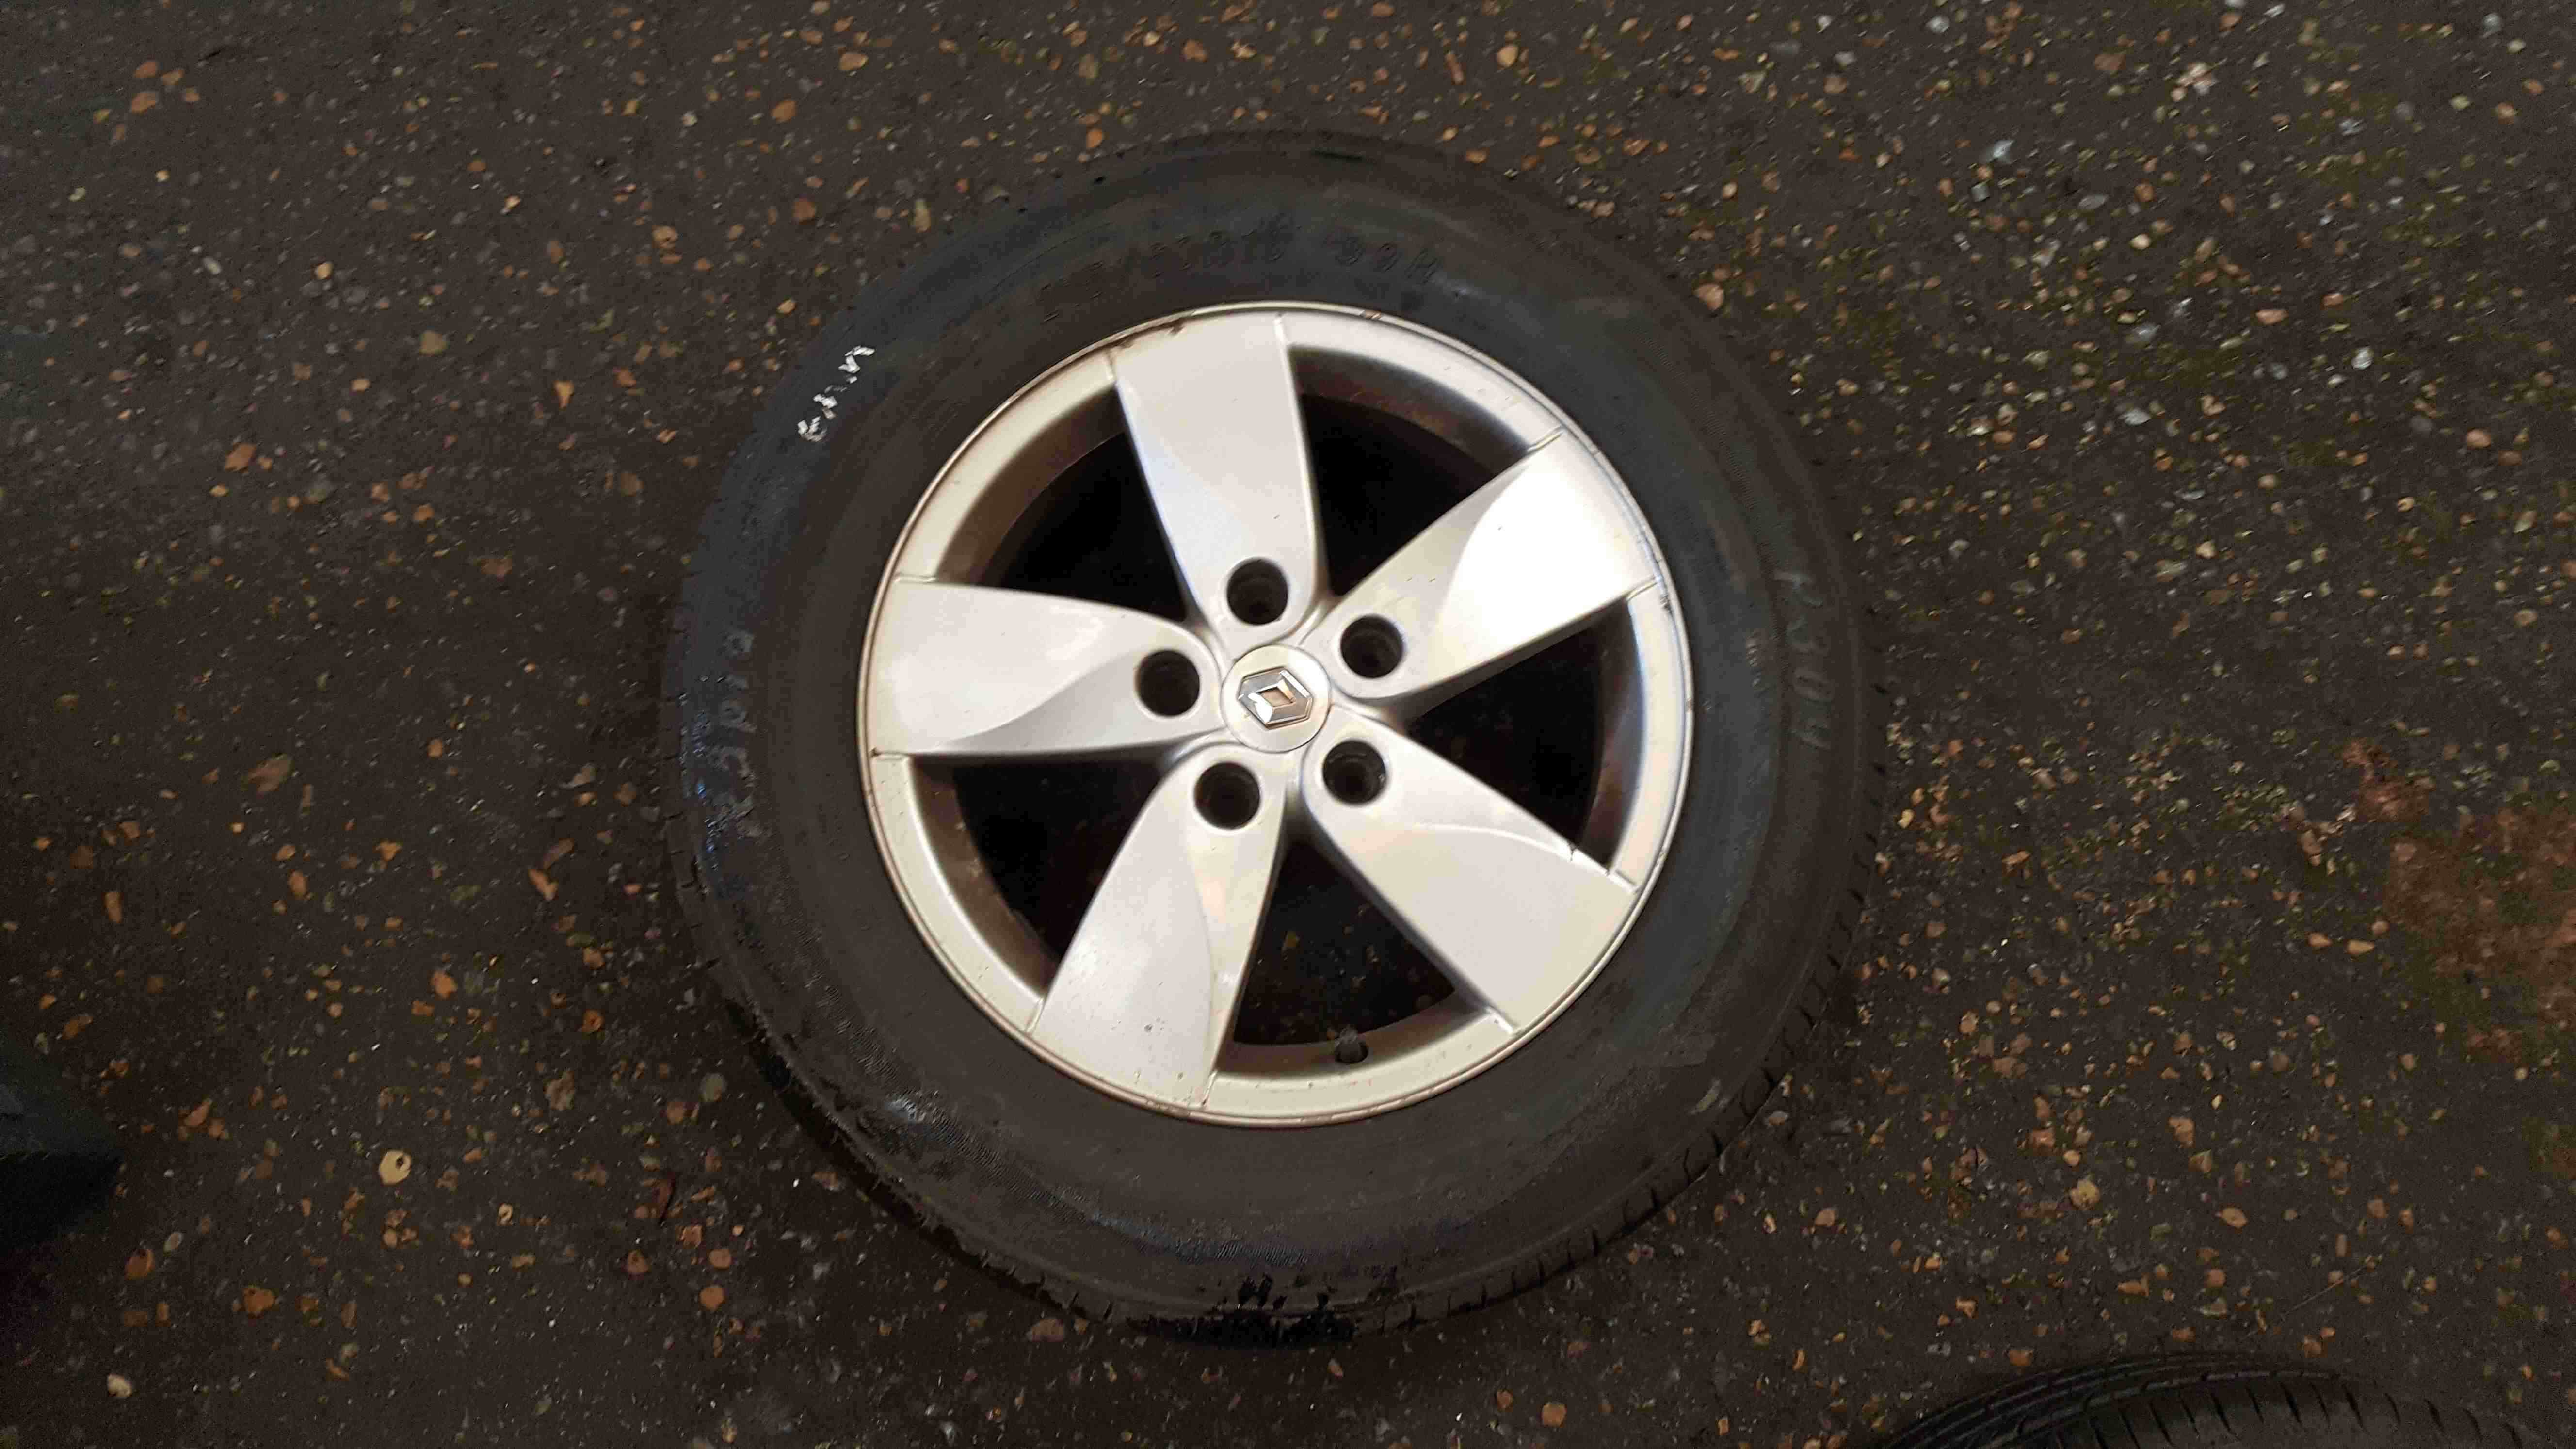 Renault Megane MK3 2008-2014 Proteus Alloy Wheel 215 60 16 6mm